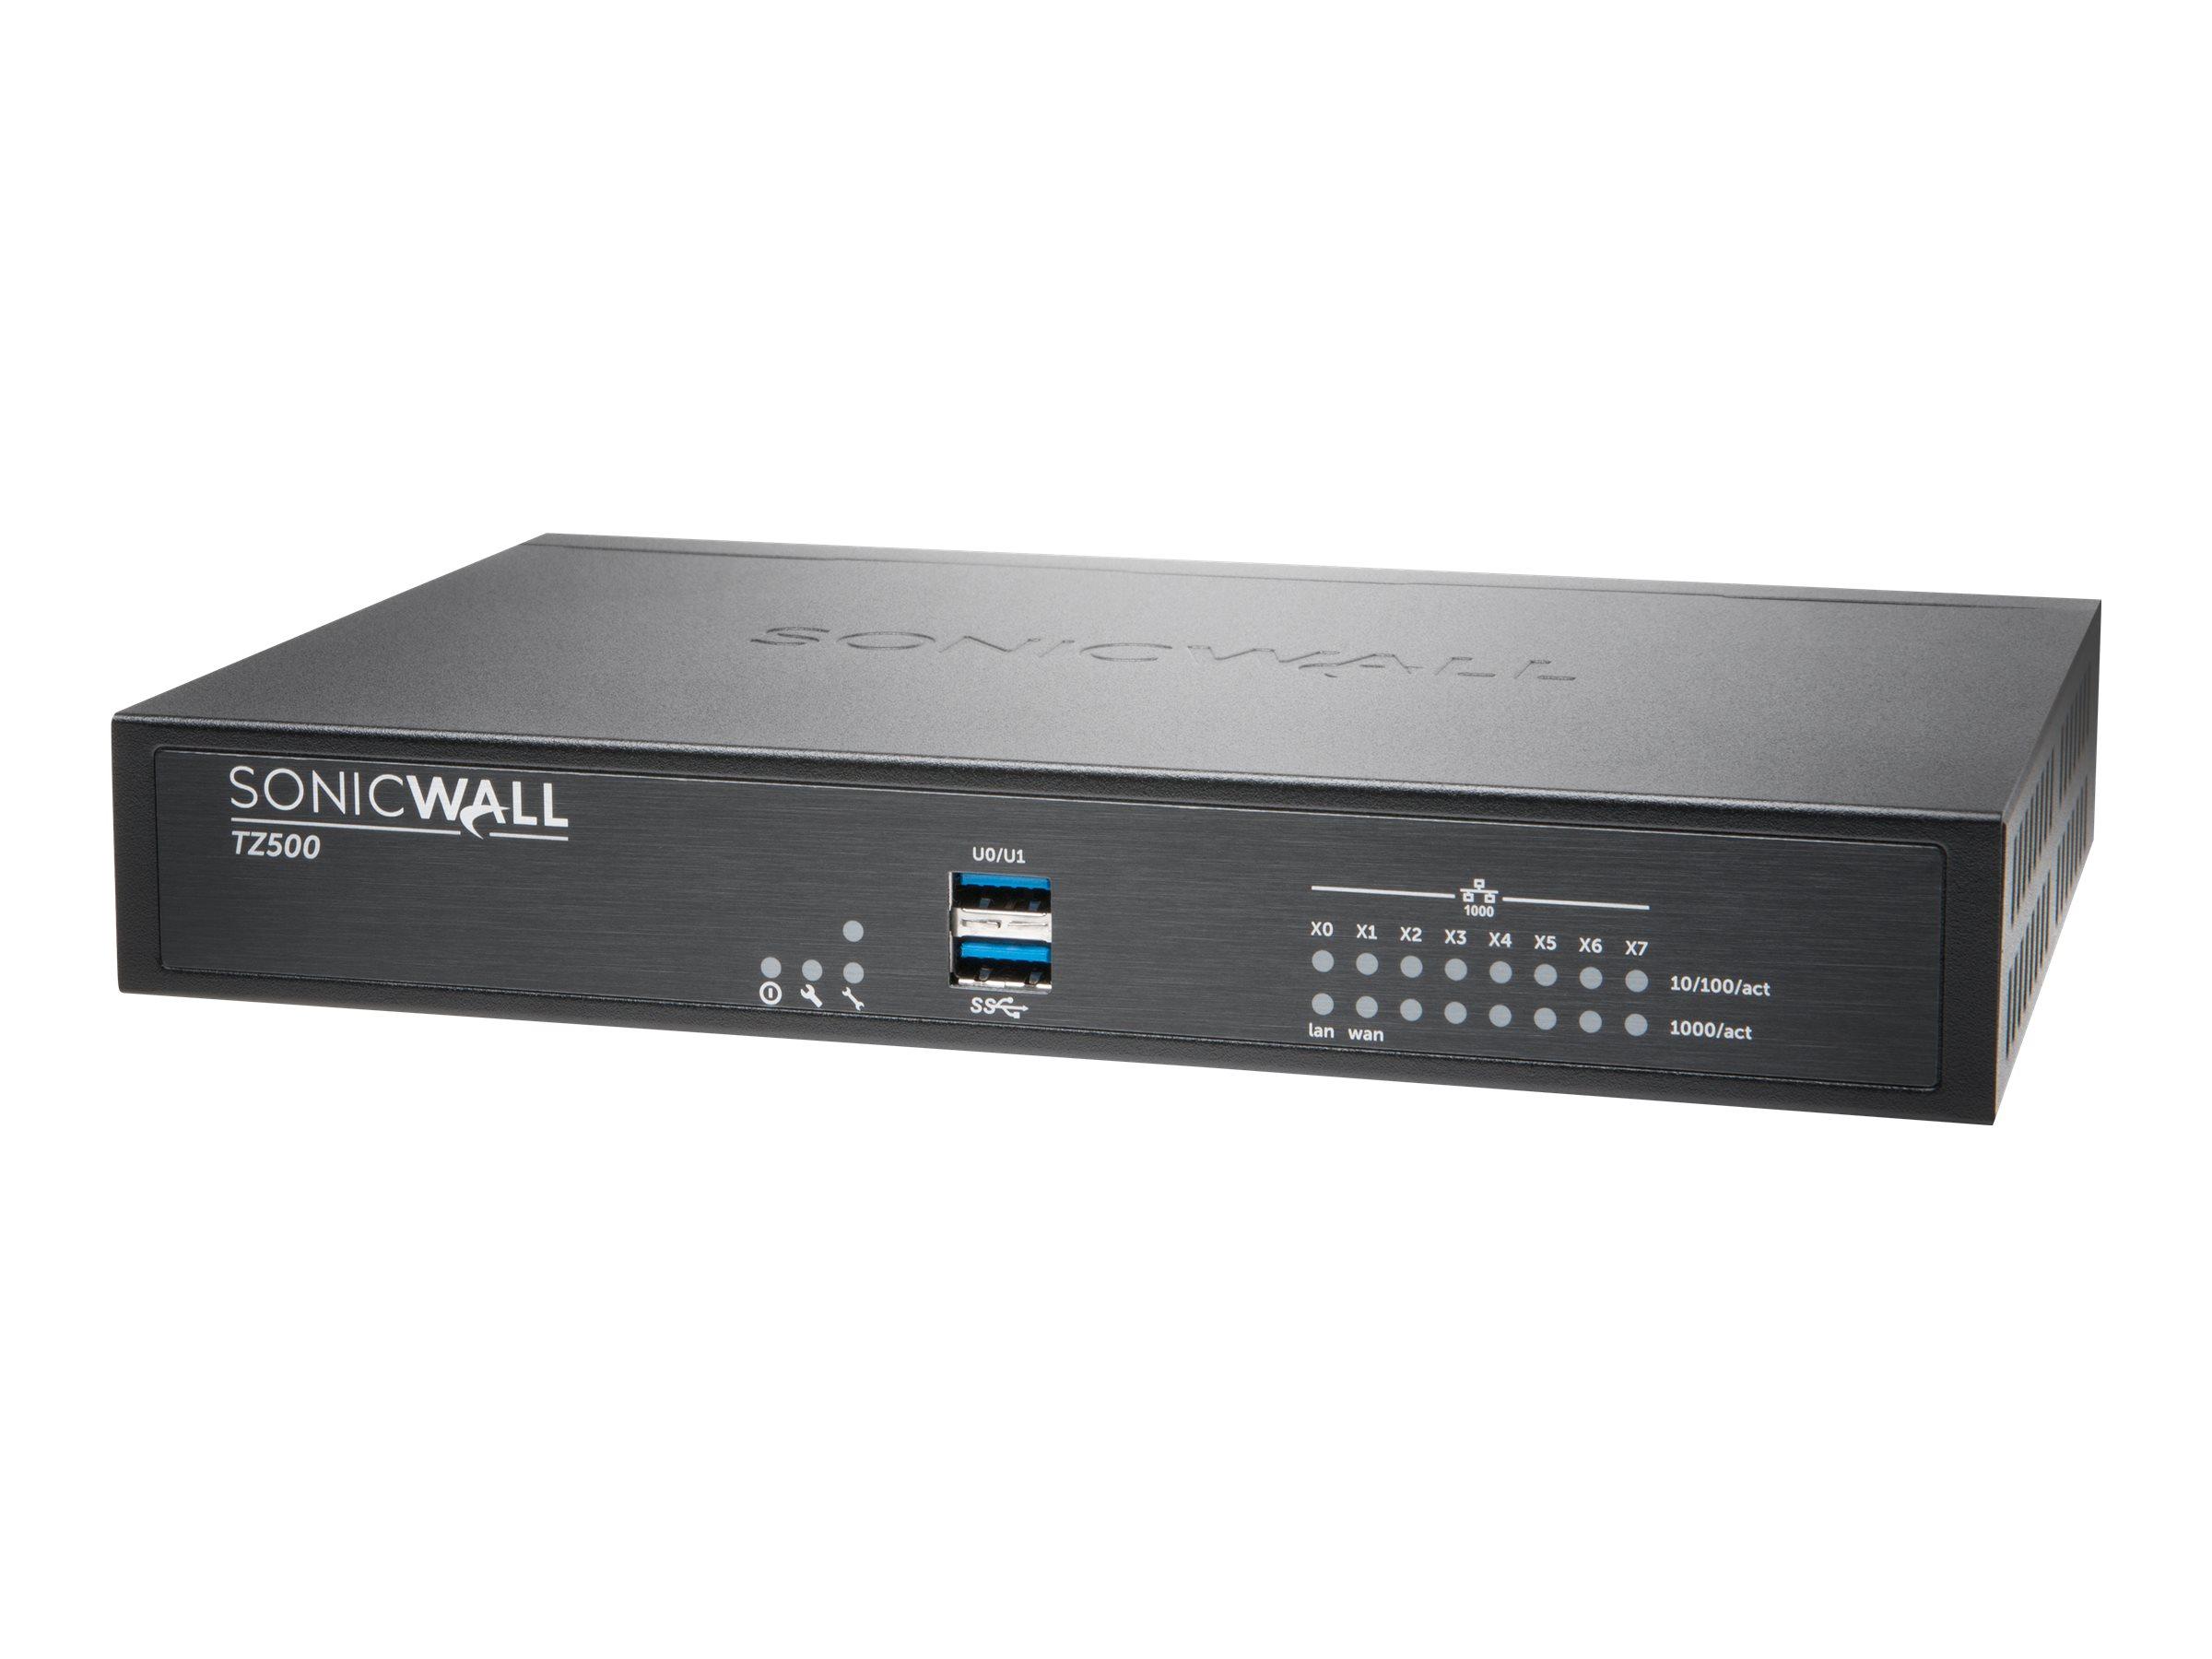 SonicWall TZ500 - Sicherheitsgerät - 8 Anschlüsse - GigE - NFR